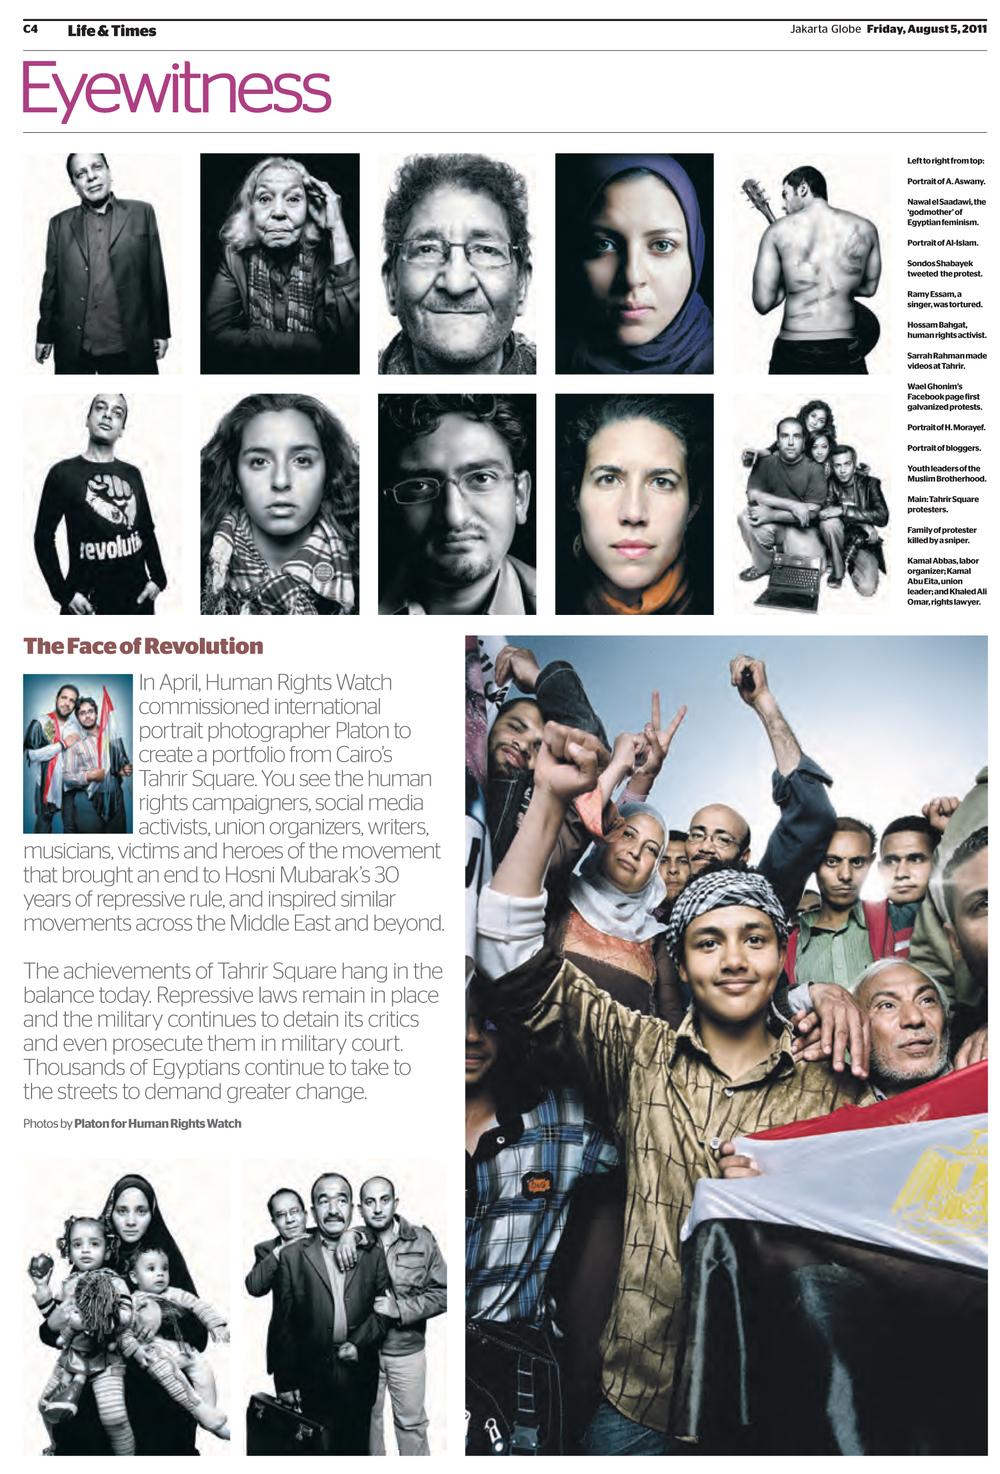 JakartaGlobeIndonesia_Egypt.png